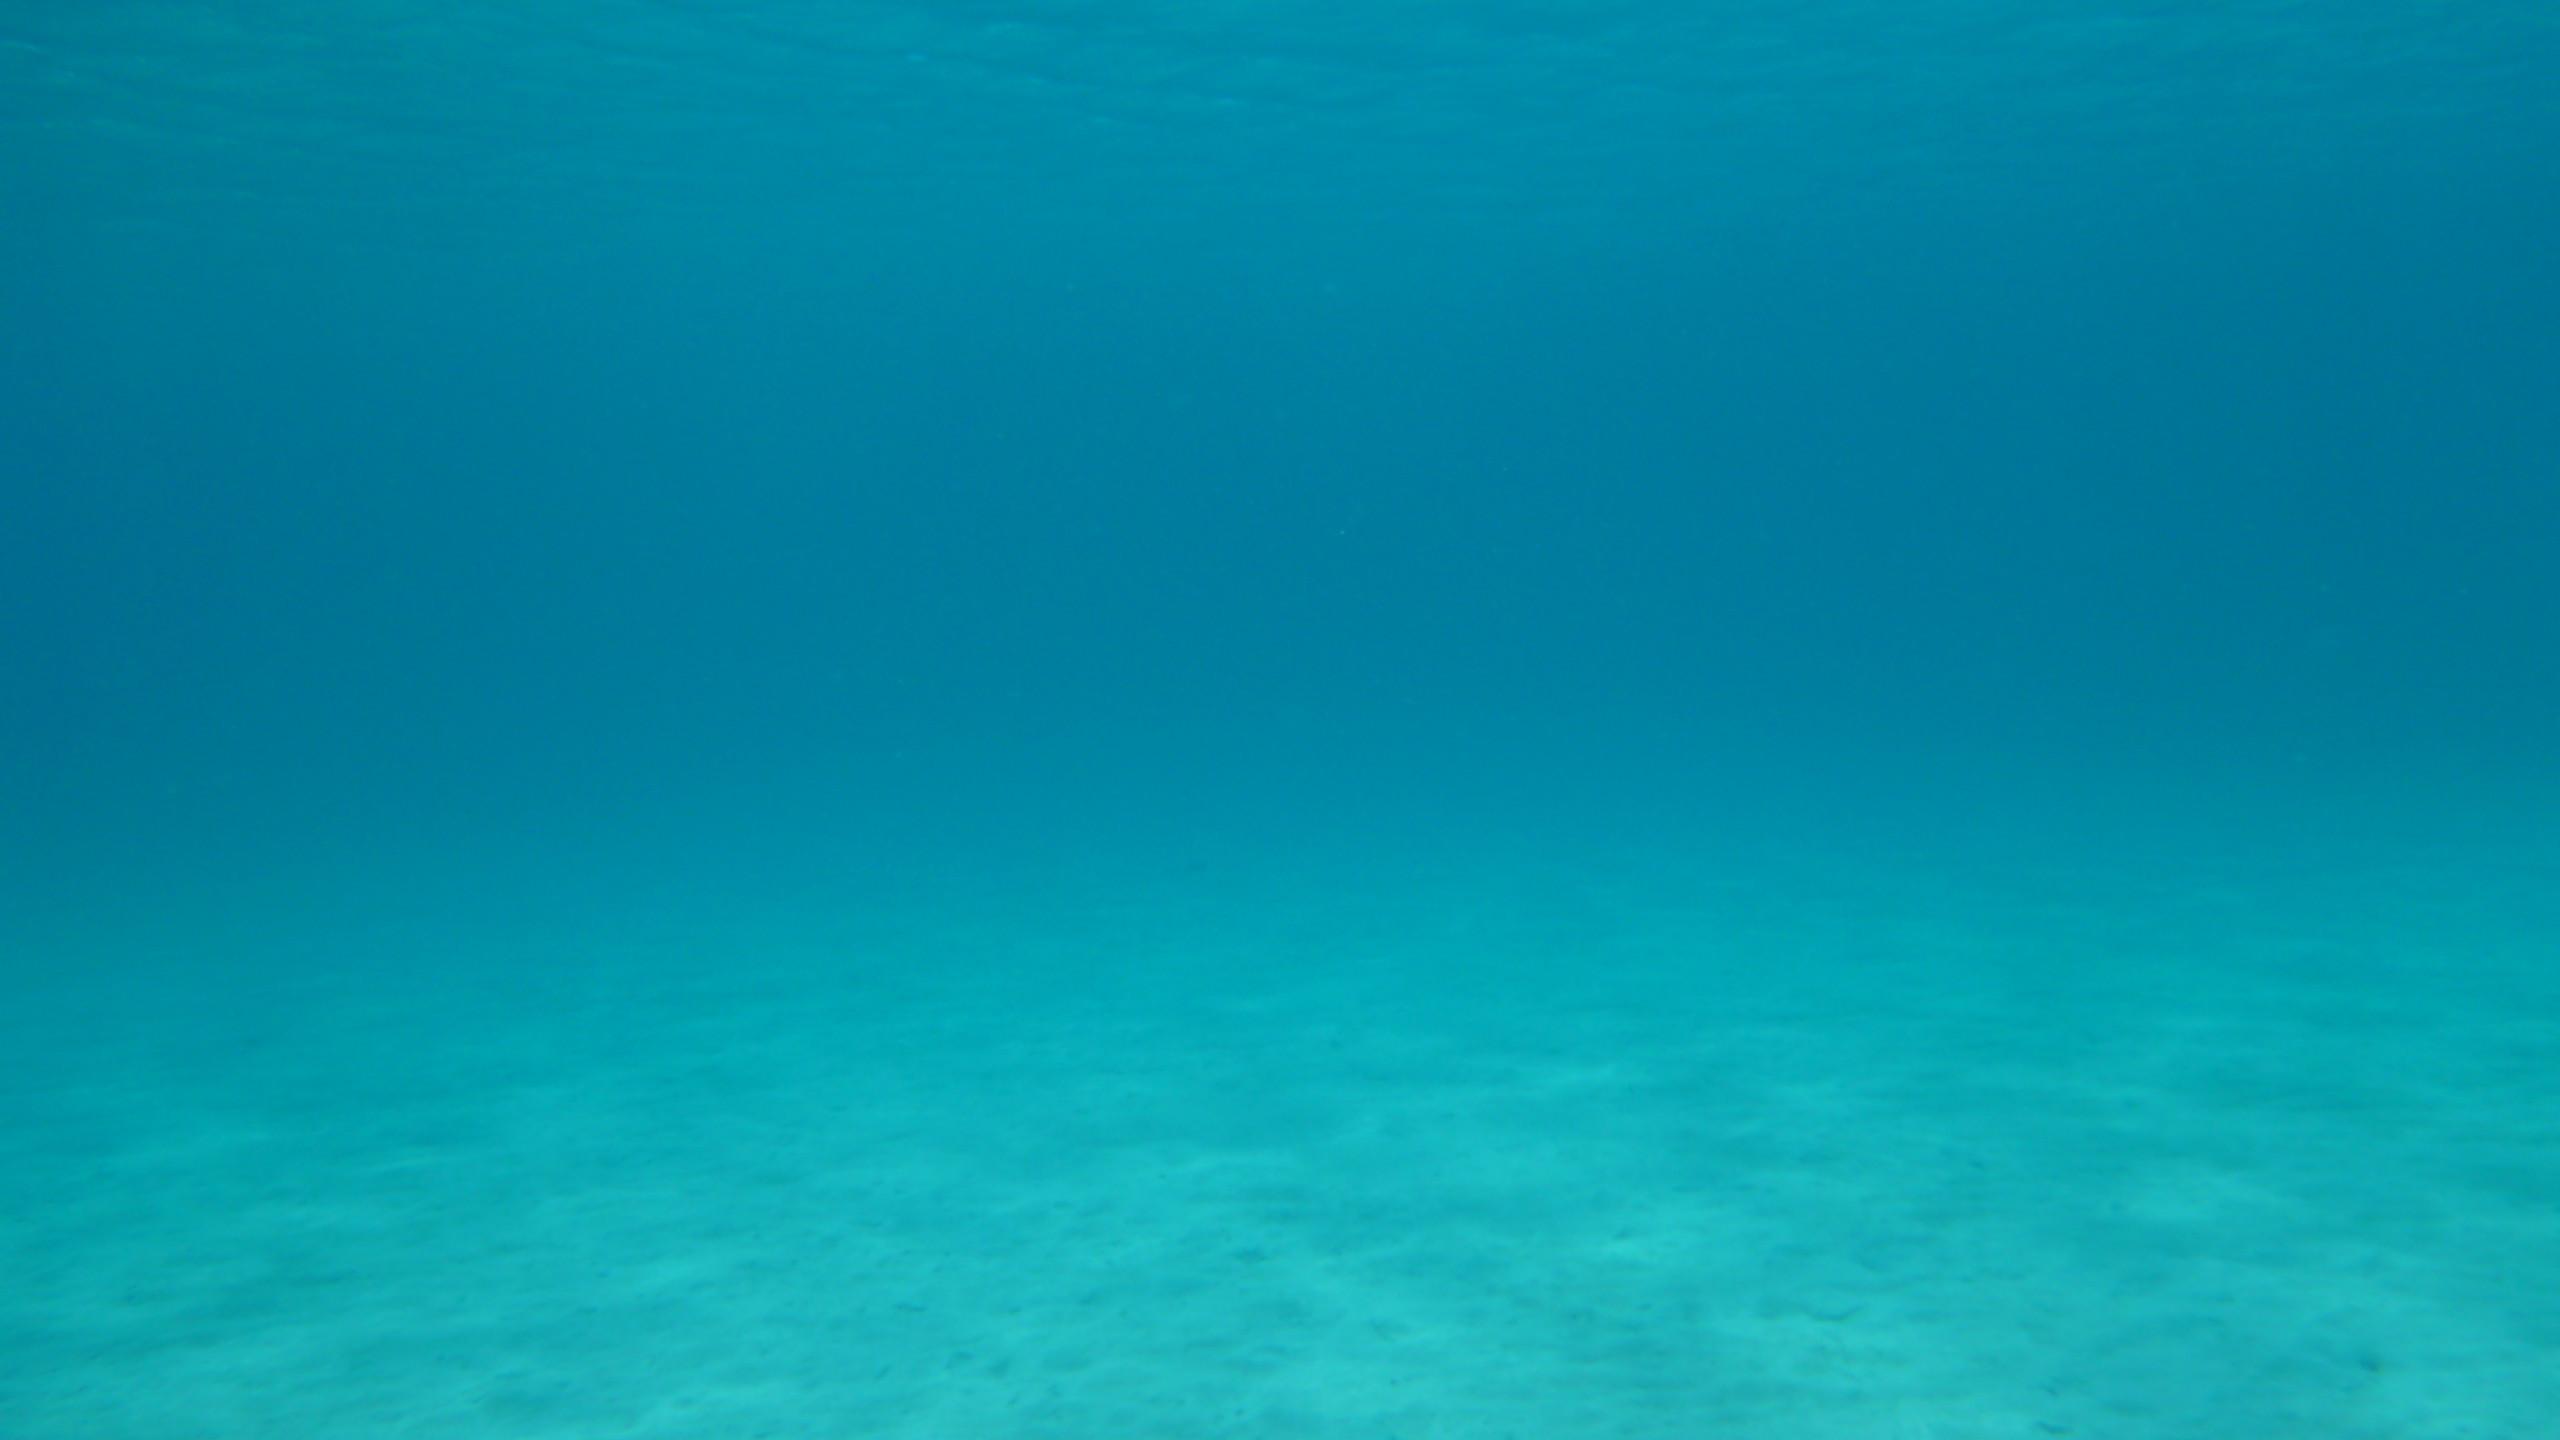 BOTPOST] Beautiful clear blue water in the Caribbean iimgurcom 2560x1440